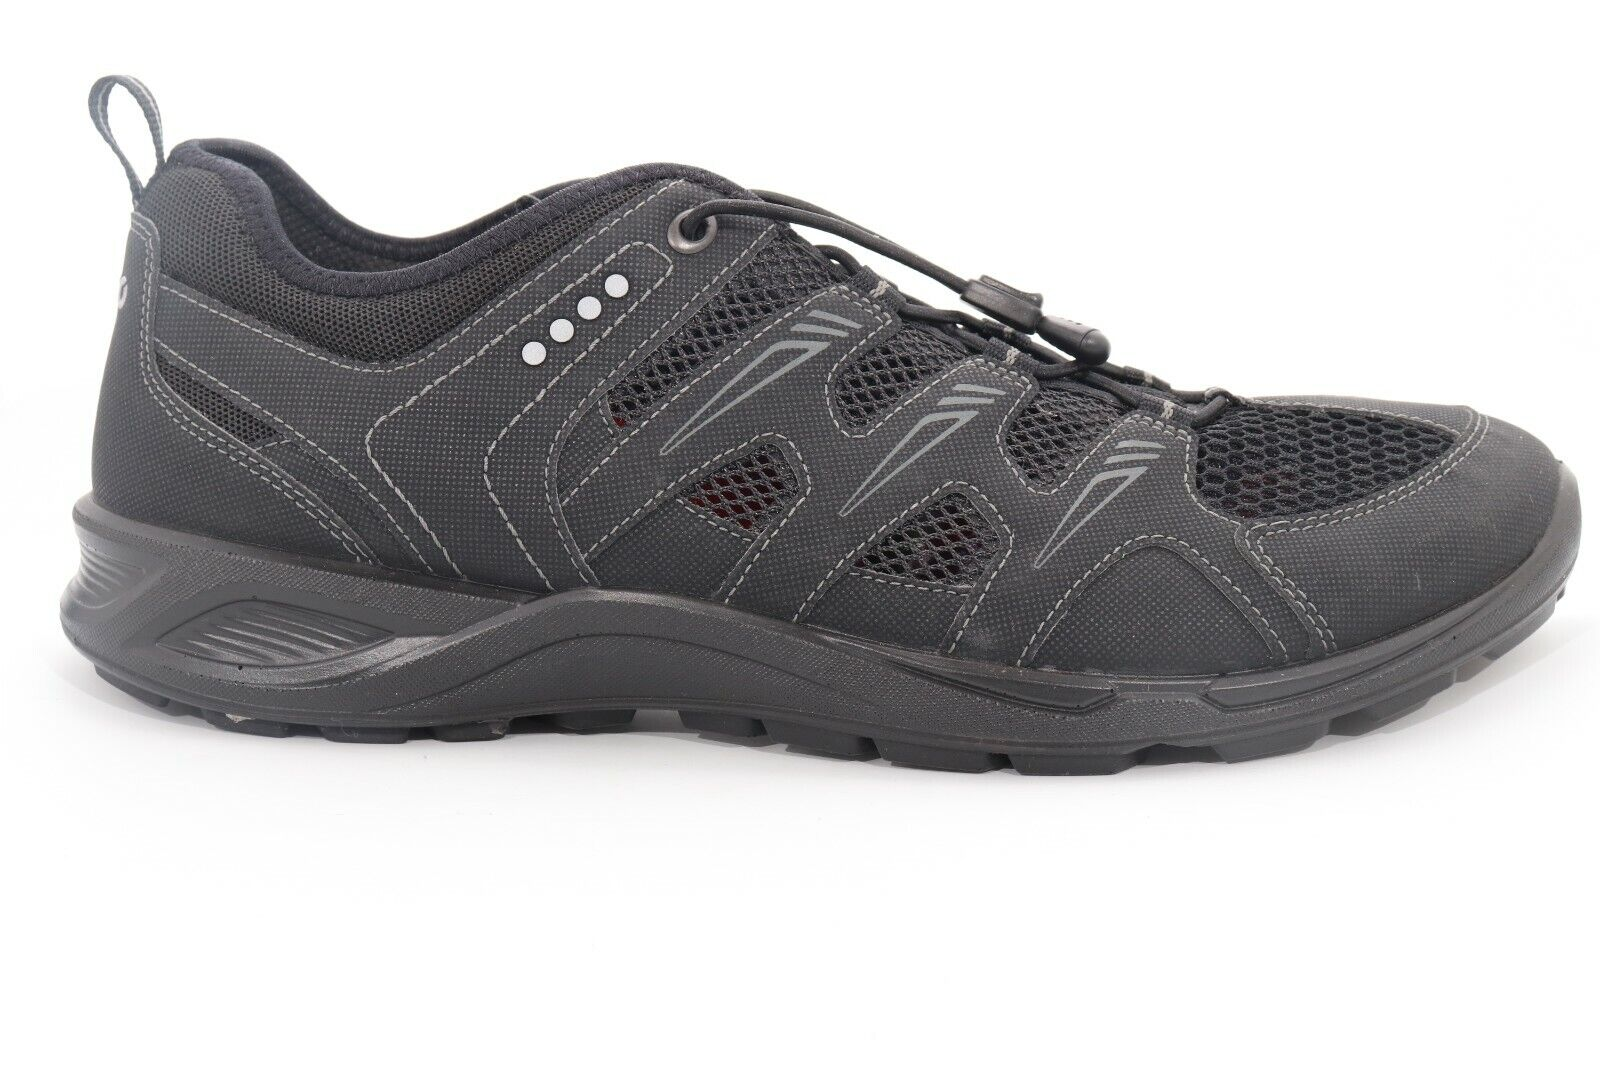 Ecco Fashion Sneaker Black Breathable Men's Size 43